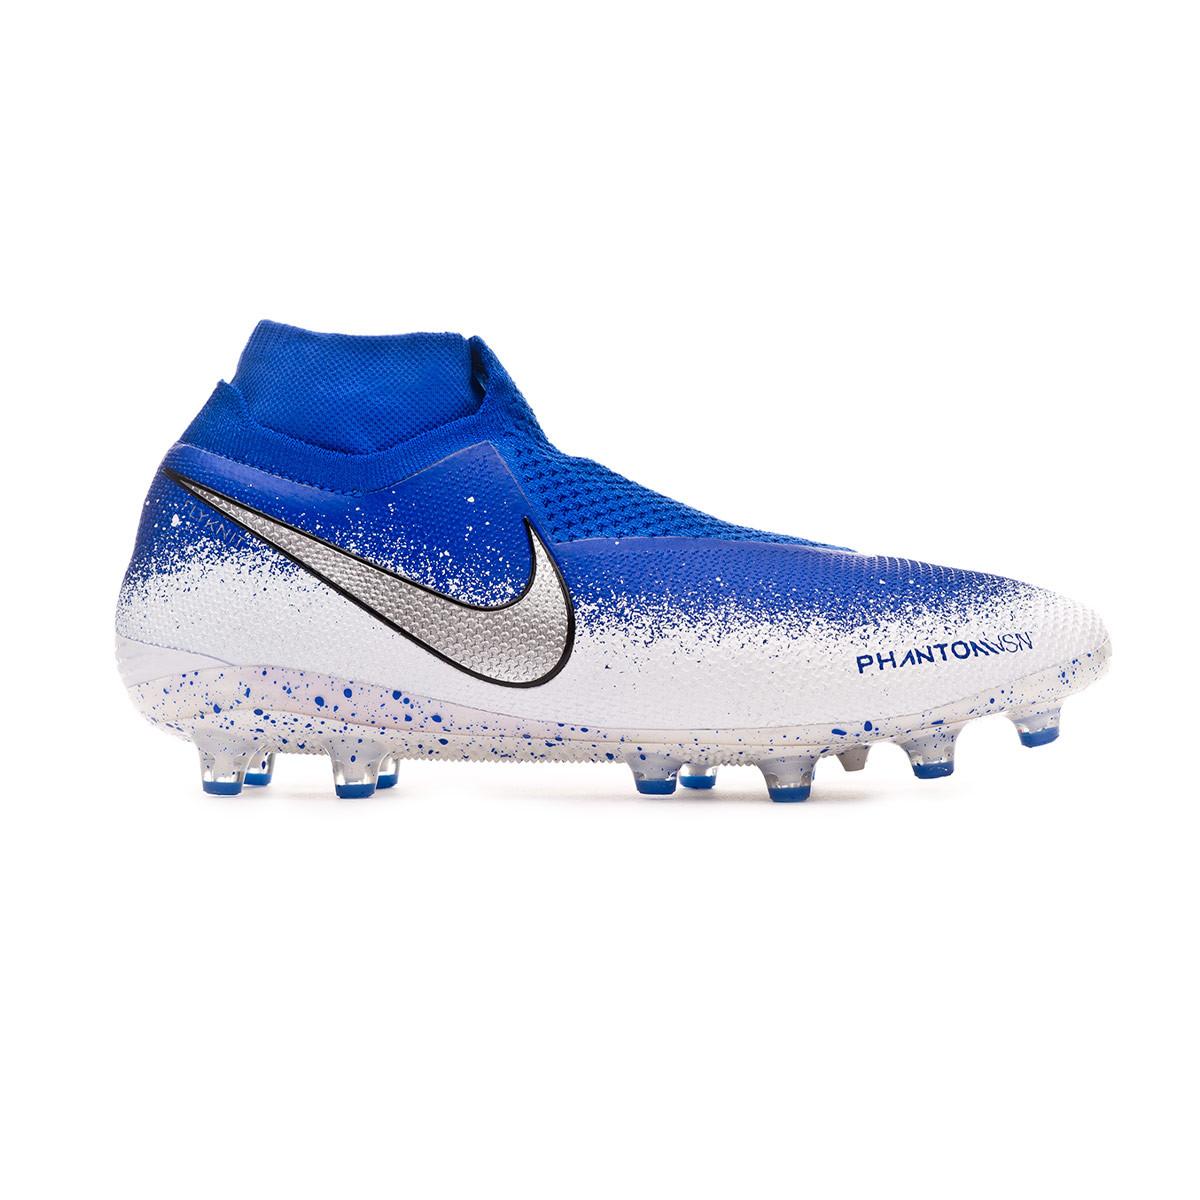 99eb5382d Football Boots Nike Phantom Vision Elite DF AG-Pro Racer blue-Chrome-White  - Football store Fútbol Emotion